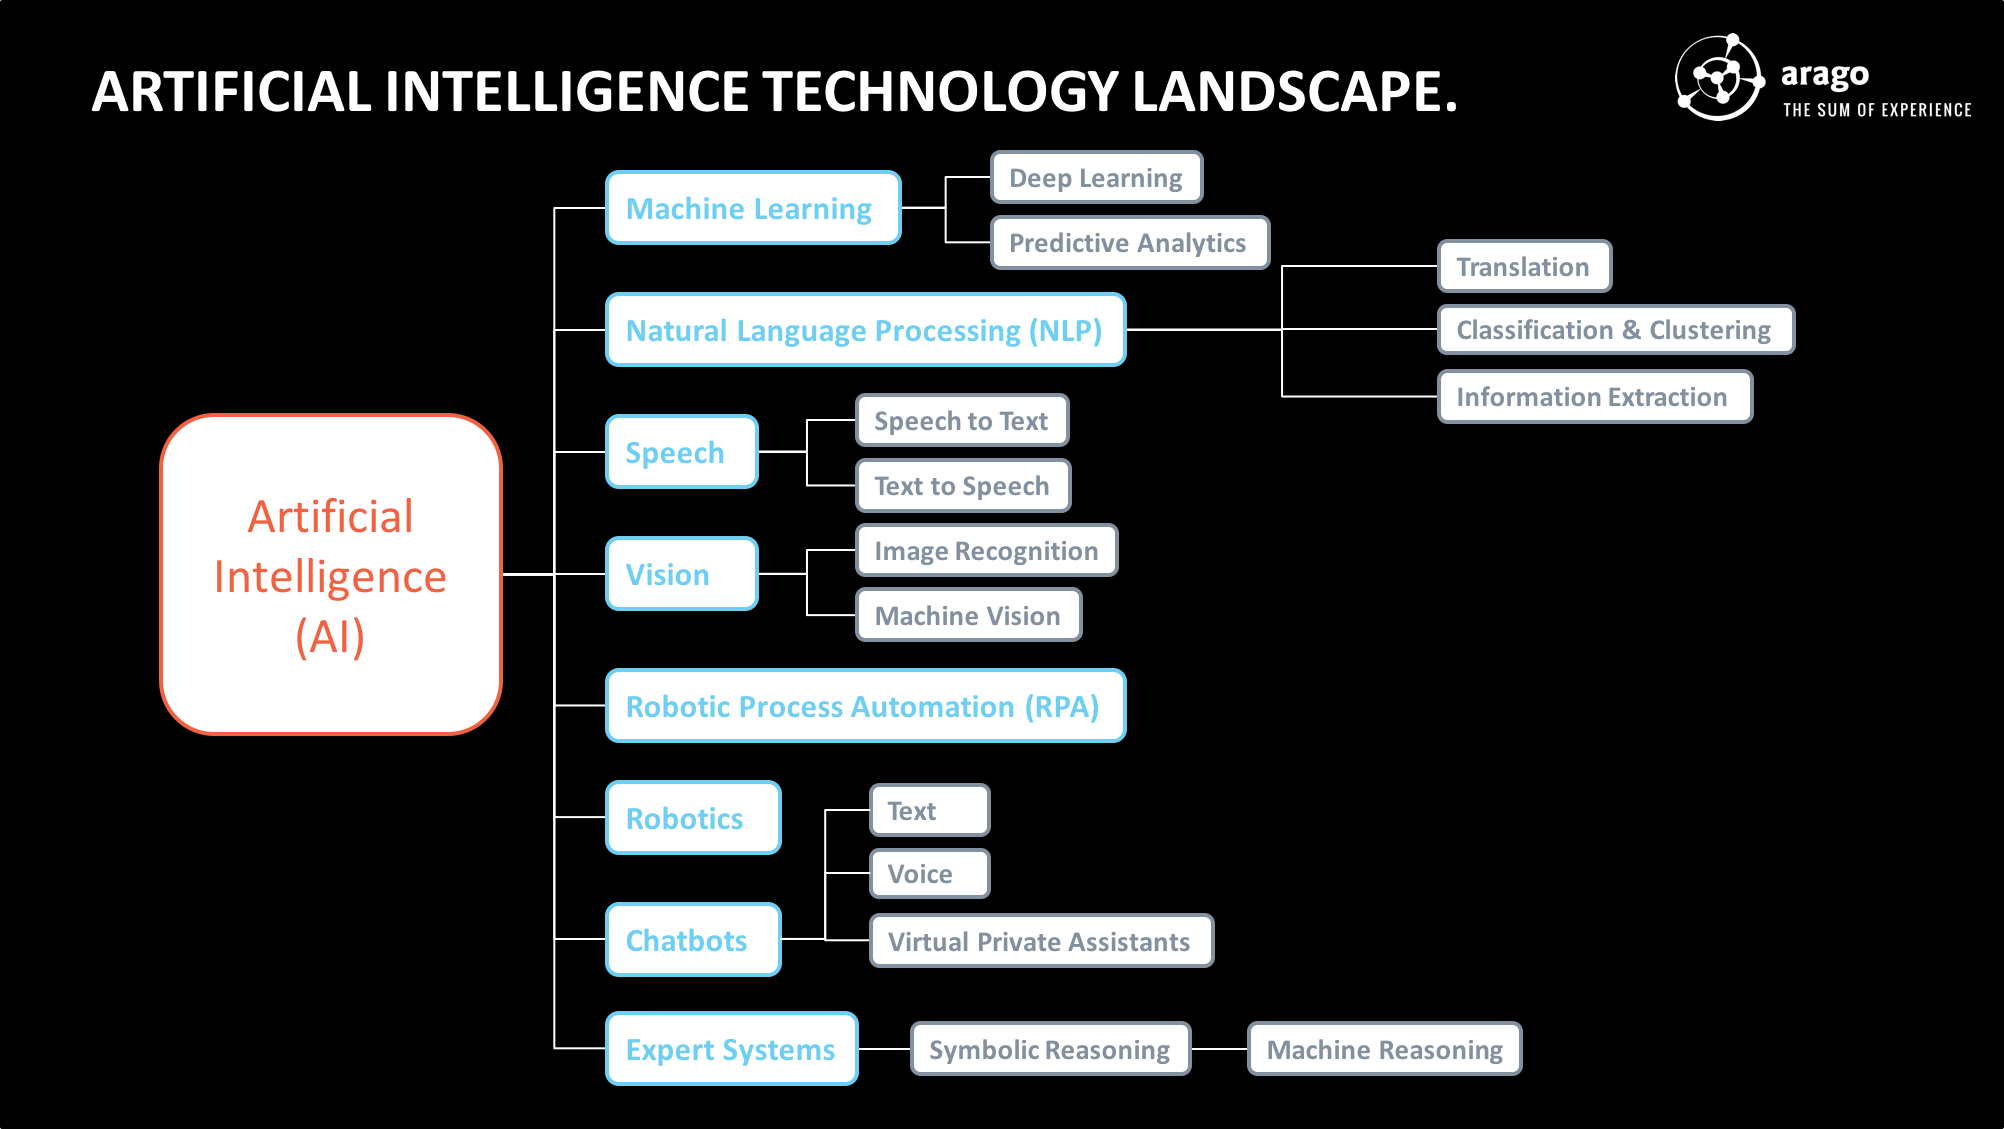 Figure: Artificial Intelligence Technology Landscape